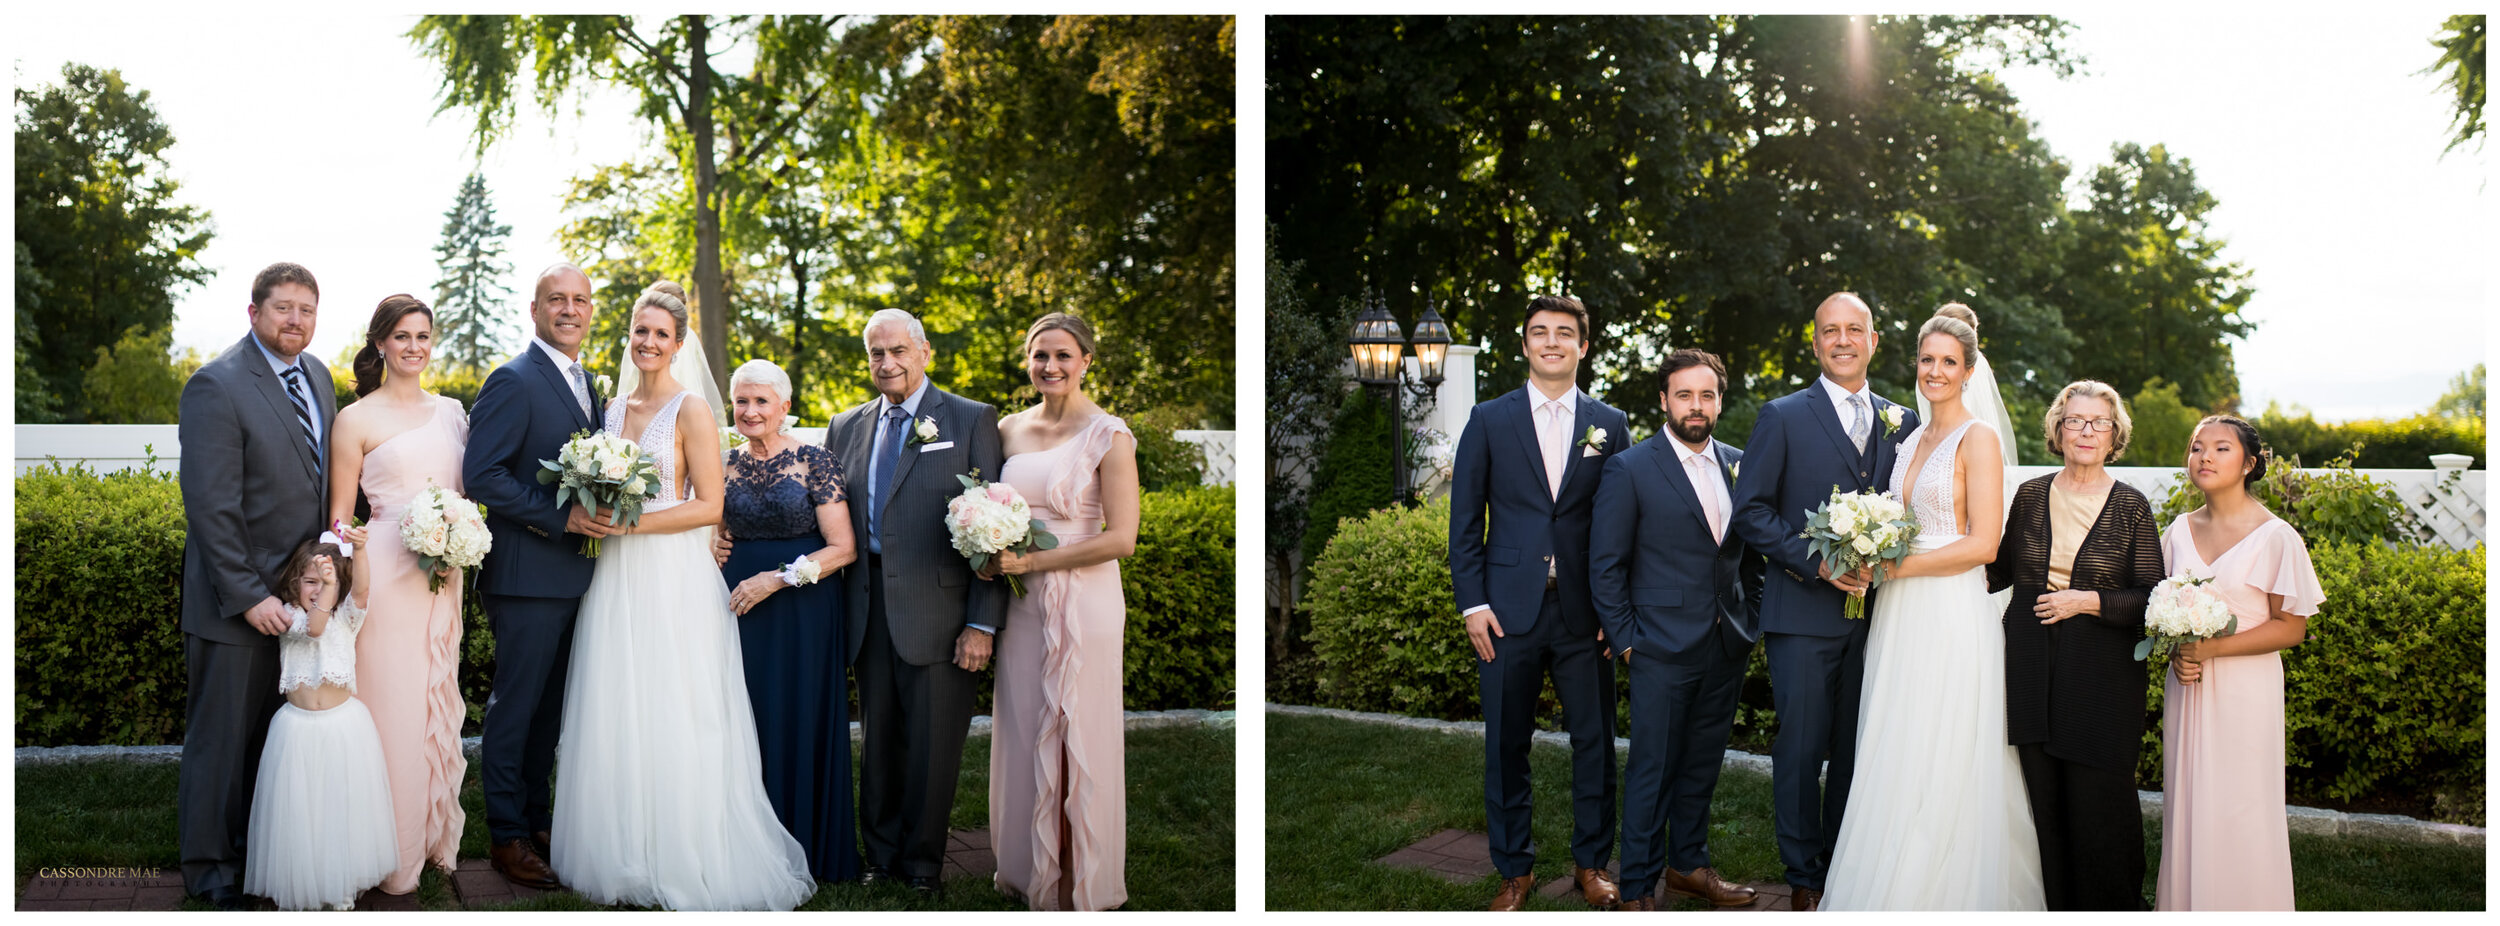 Cassondre Mae Photography Briarcliff Manor Wedding Photographer 6.jpg